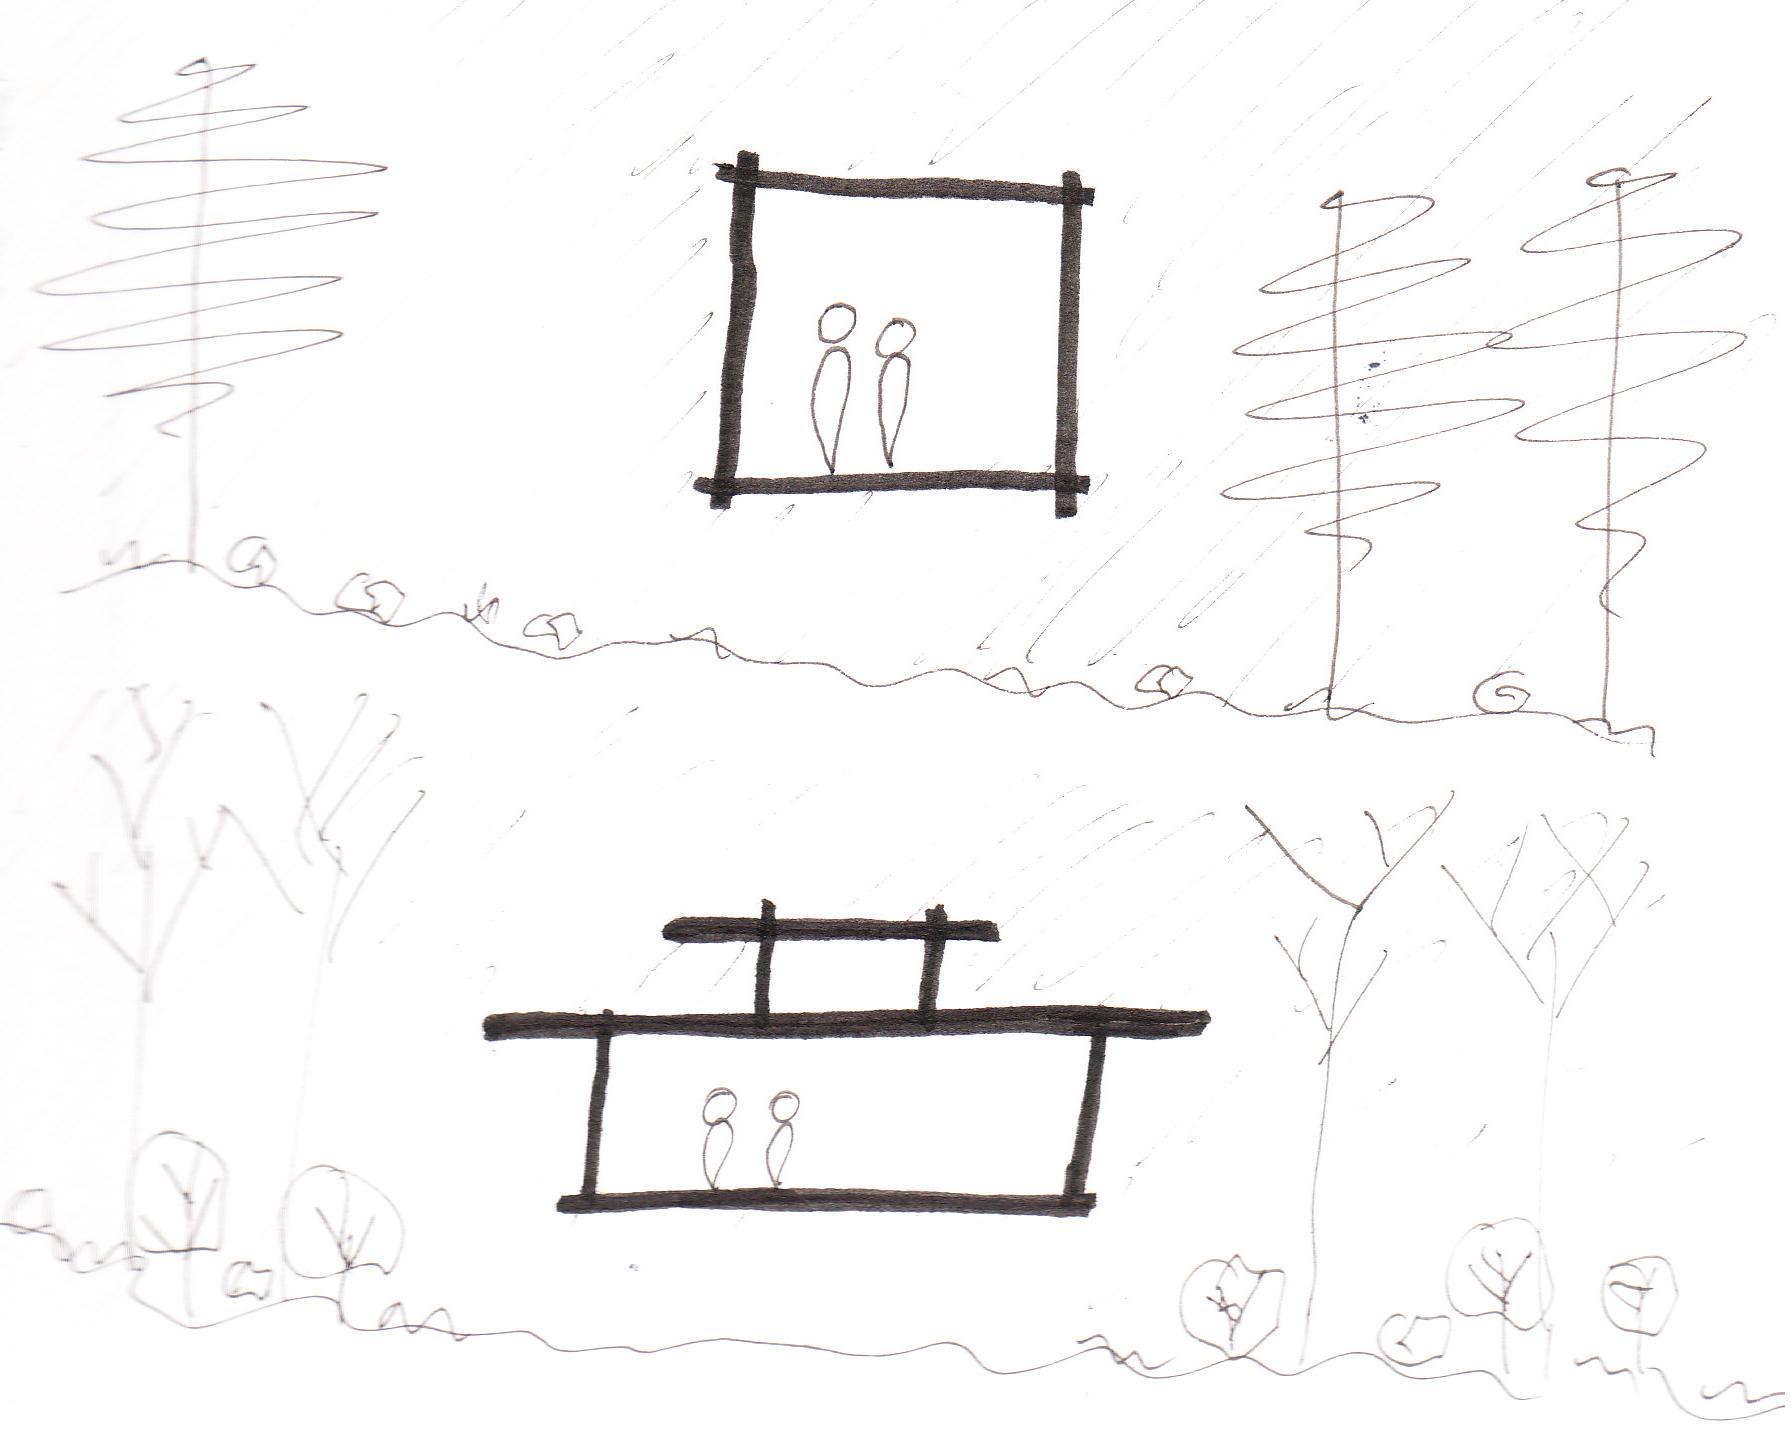 Archetype Square House Diagram